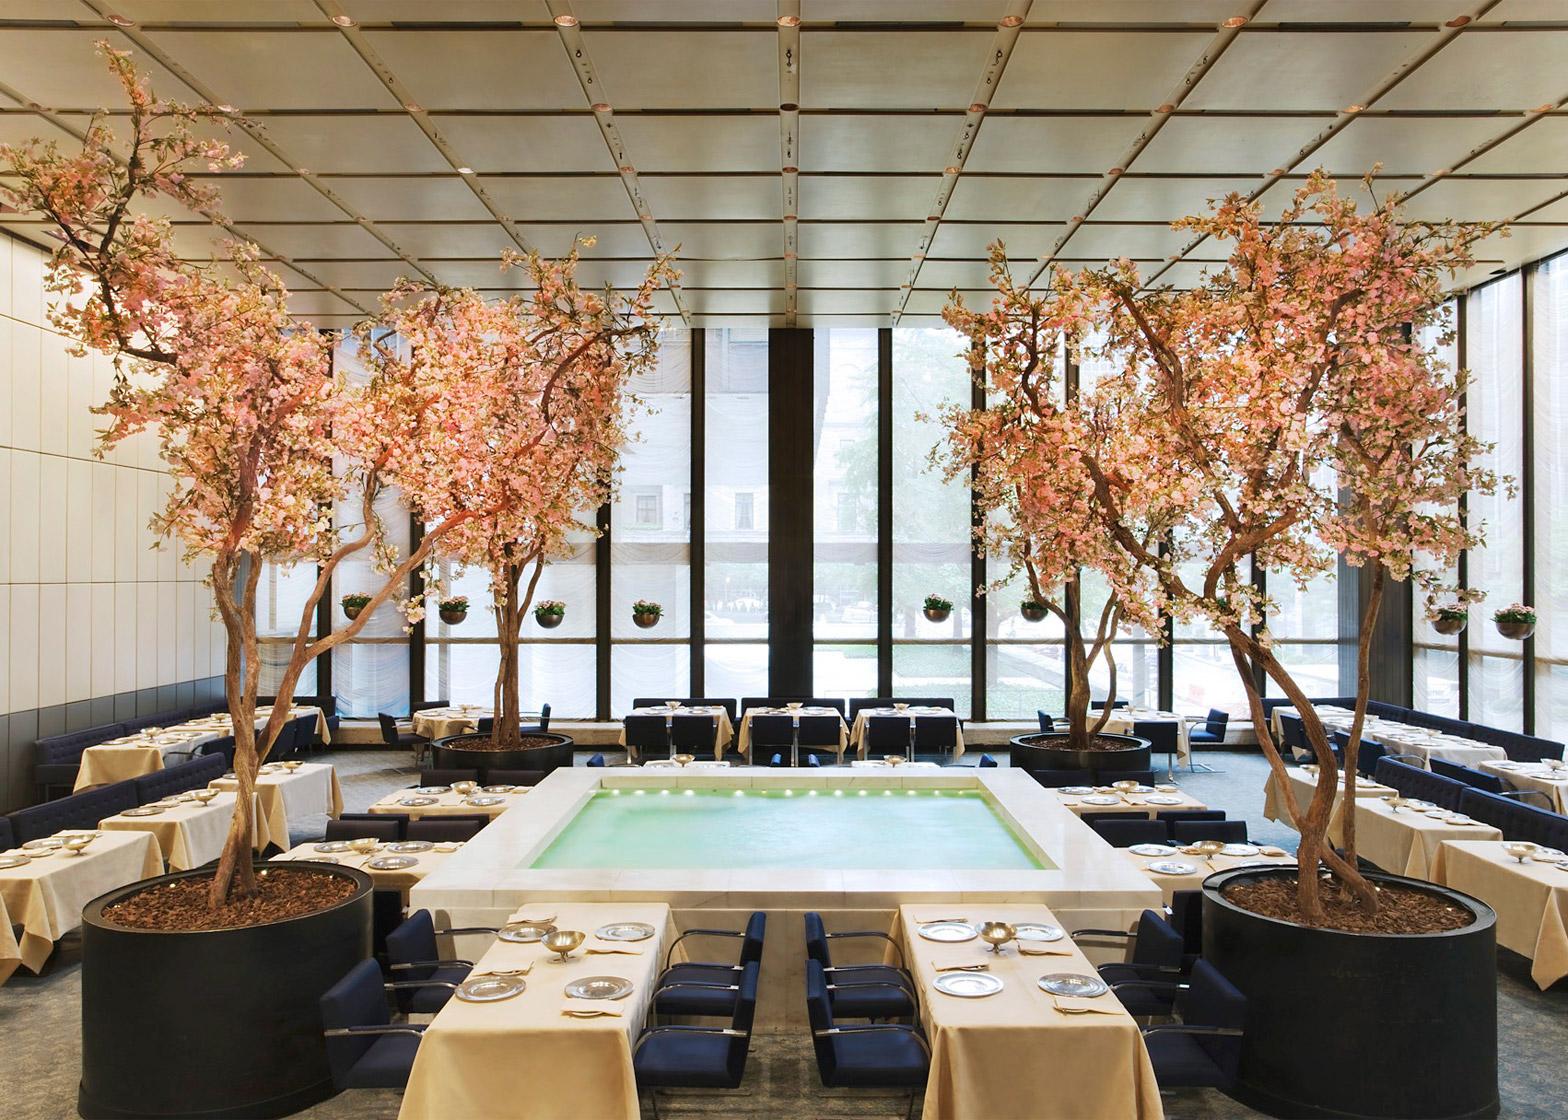 four-seasons-restaurant-interior-seagram-building-philip-johnson-mies-van-der-rohe-auction-new-york-city-usa-news-jennifer-calais-smith_dezeen_1568_7